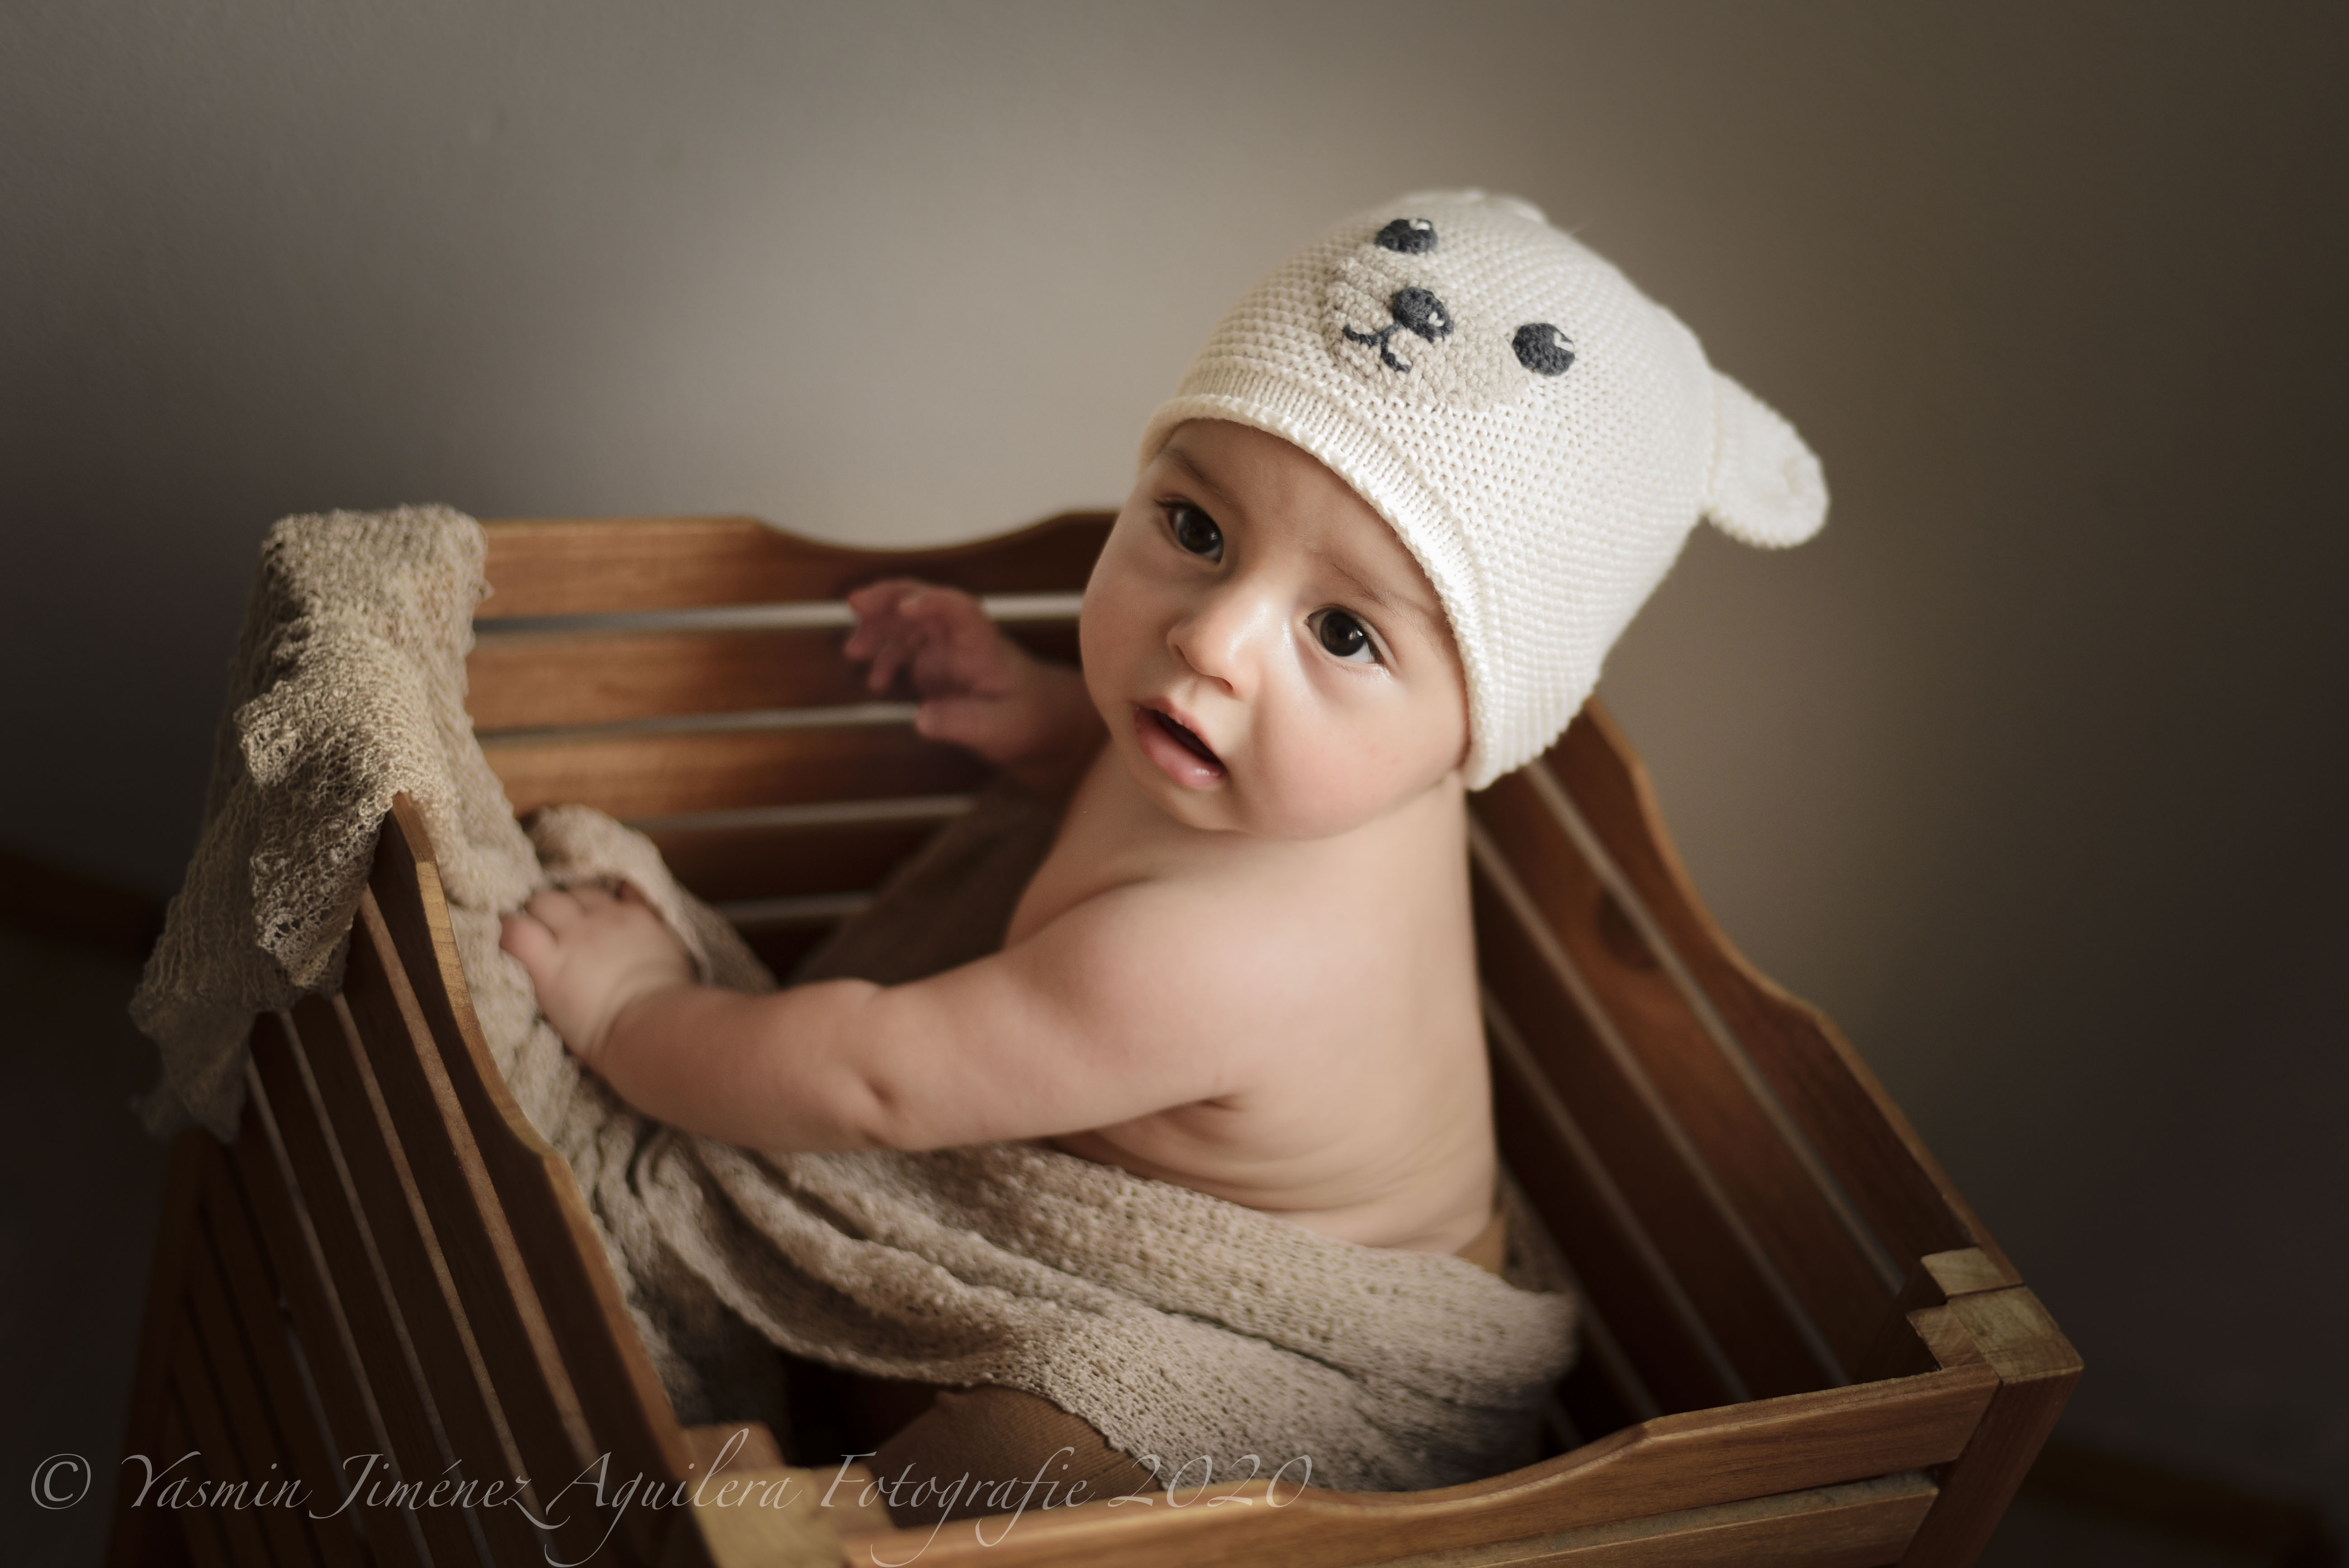 Yasmin_Jimenez_Aguilera_Fotografie_Baby_